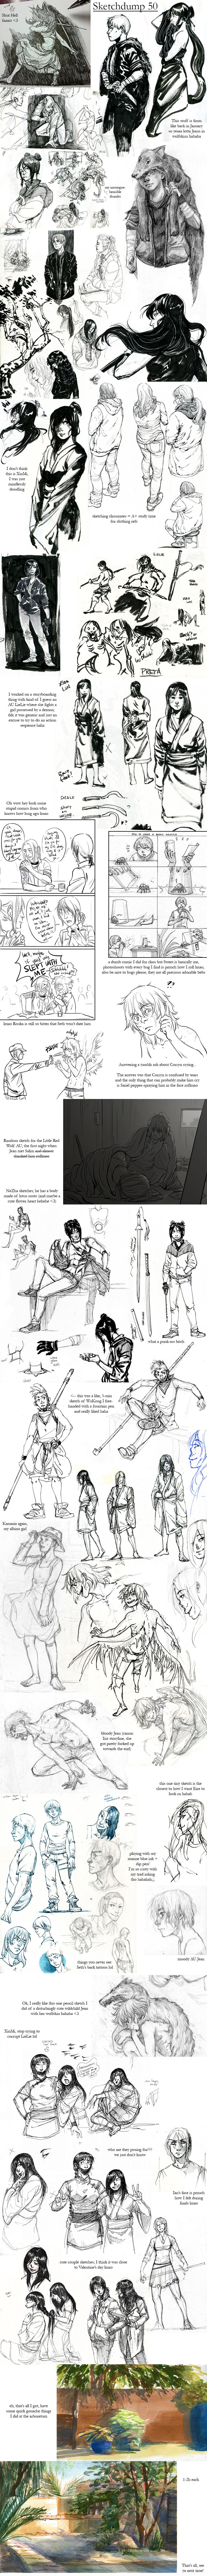 Sketchdump 50 by Laitma